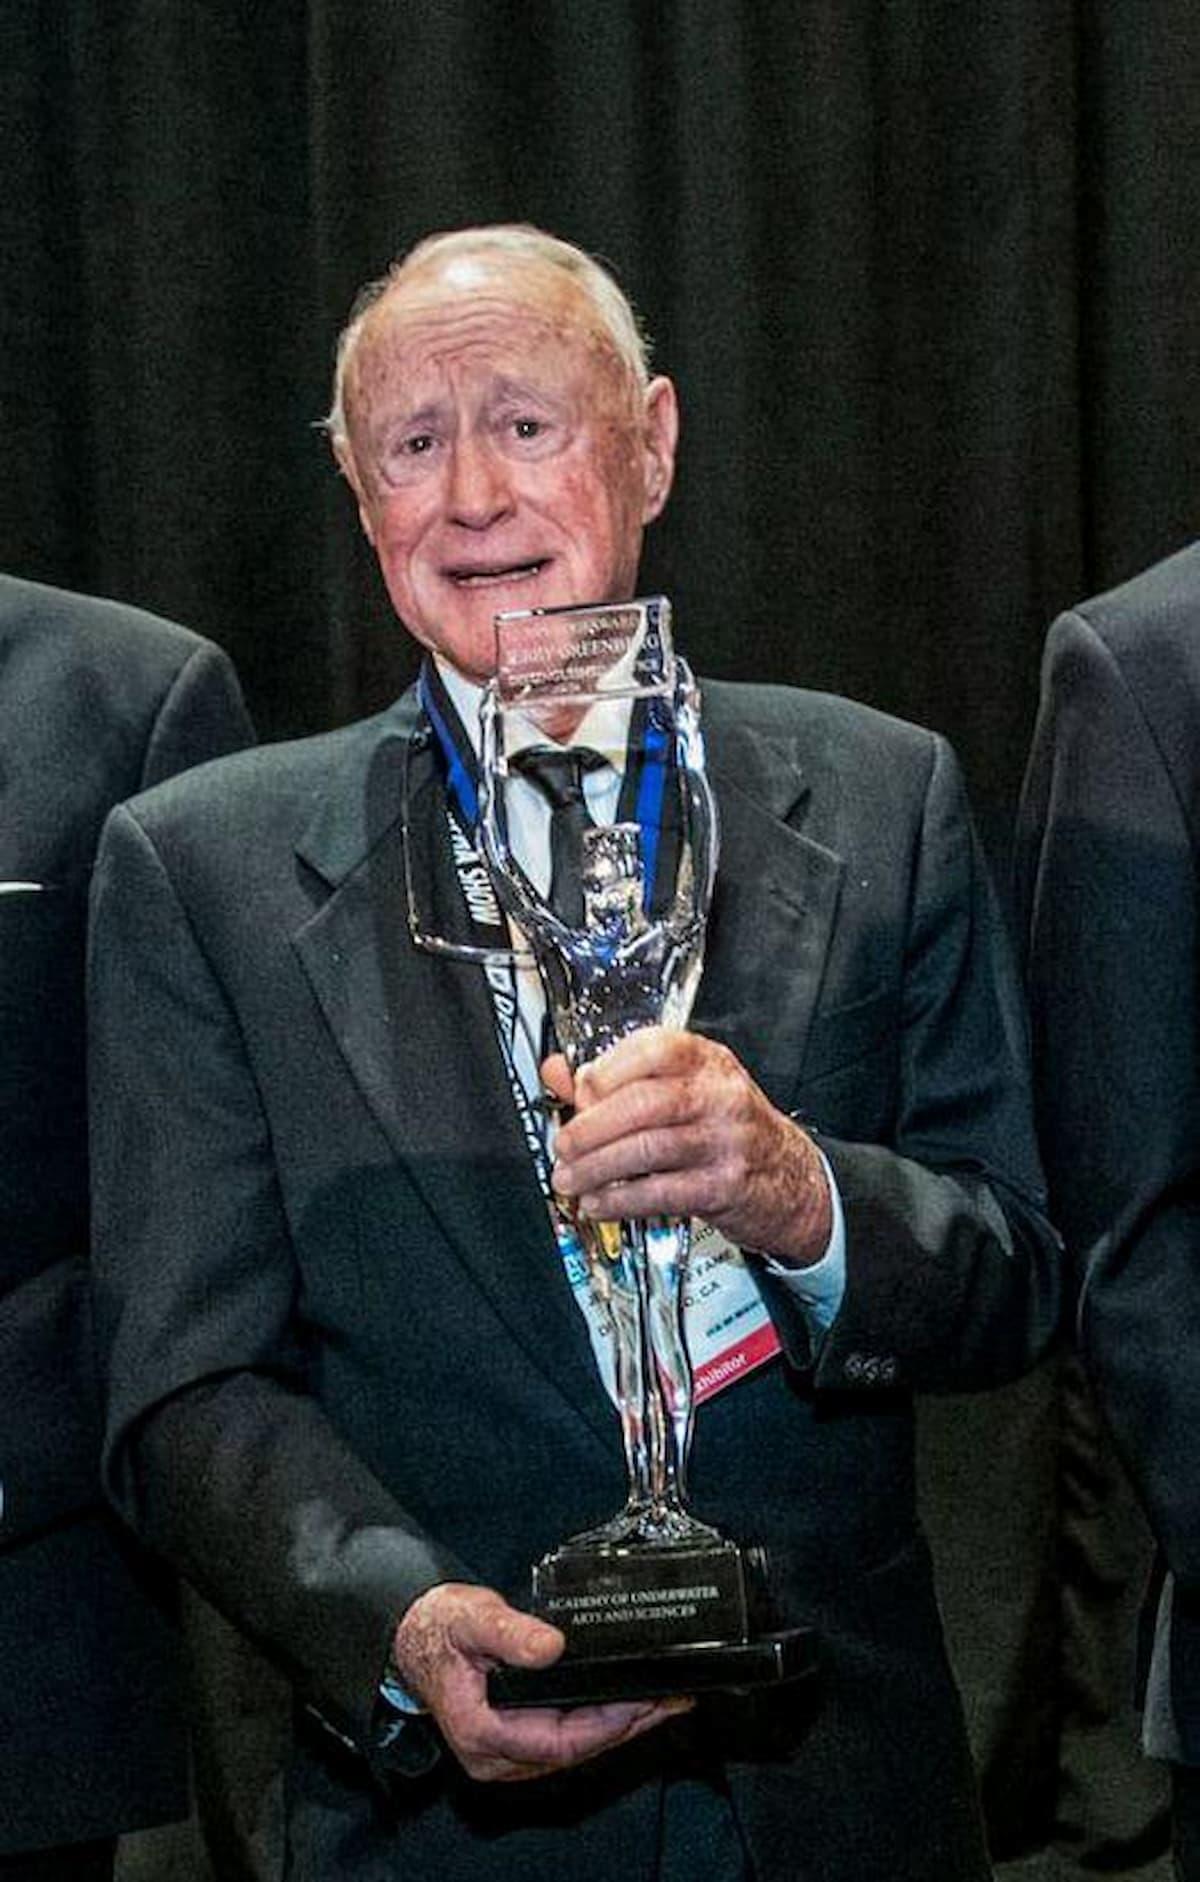 Dive industry legend Jerry Greenberg